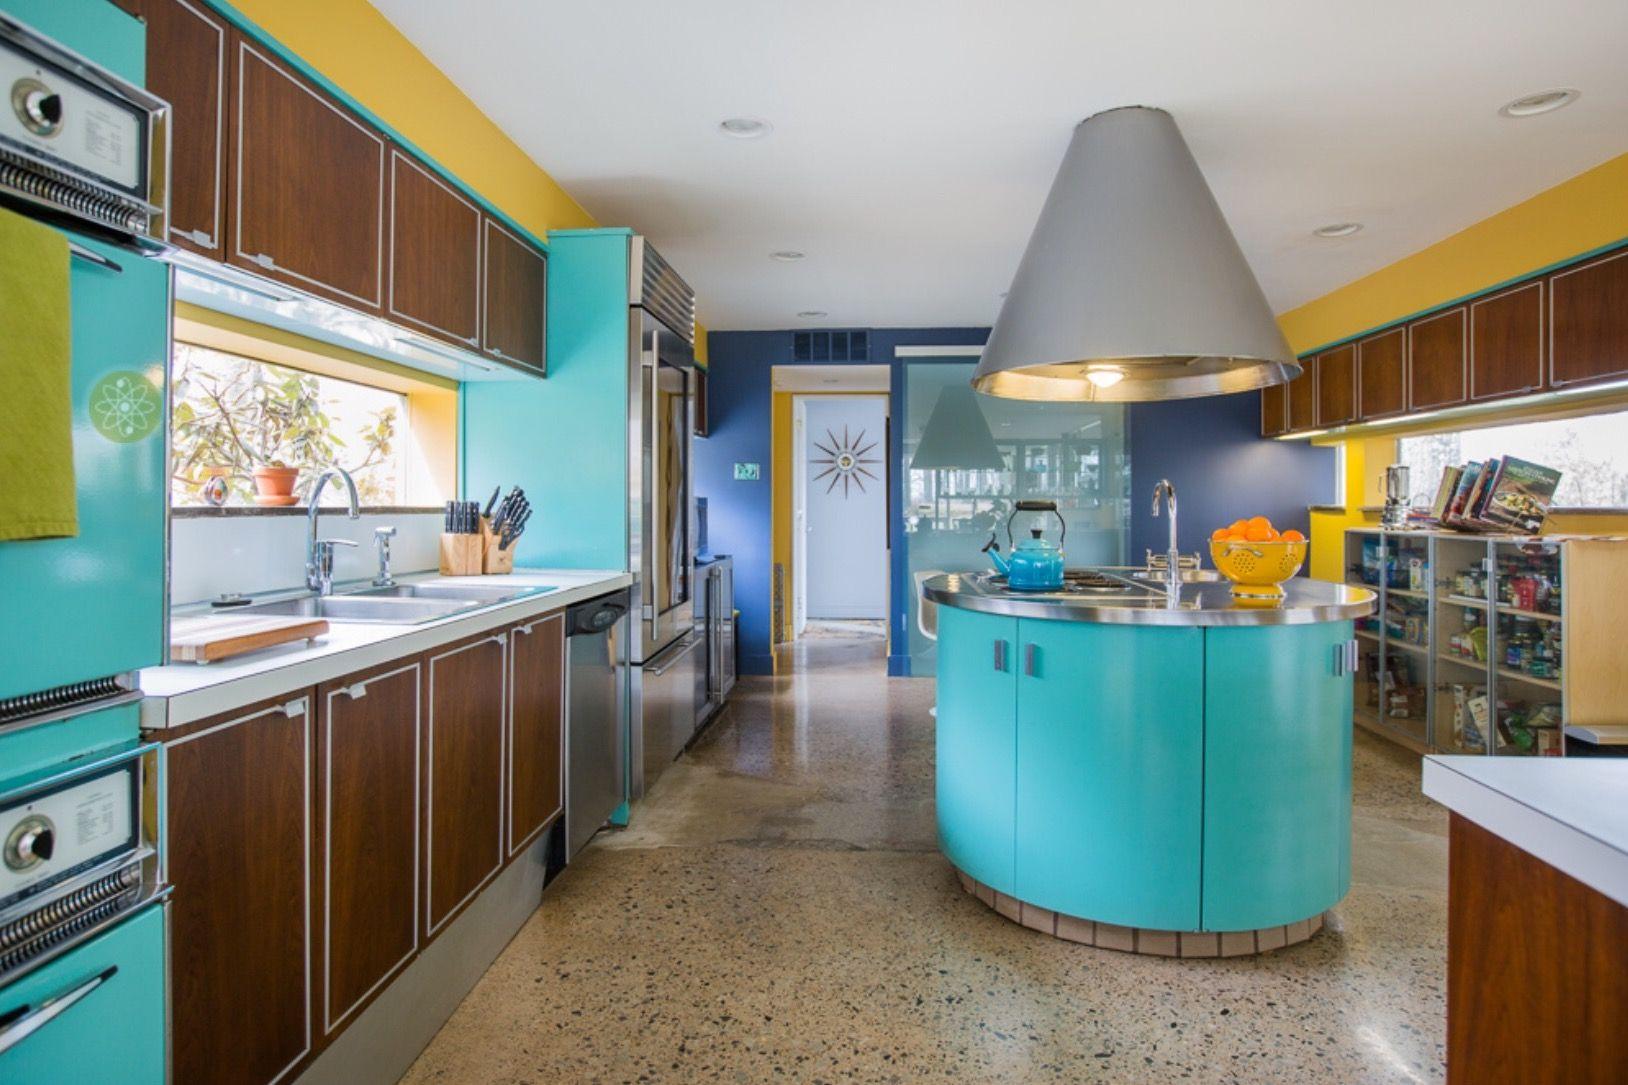 Mid Century Modern retro styled kitchen • Maude and Hermione on ...